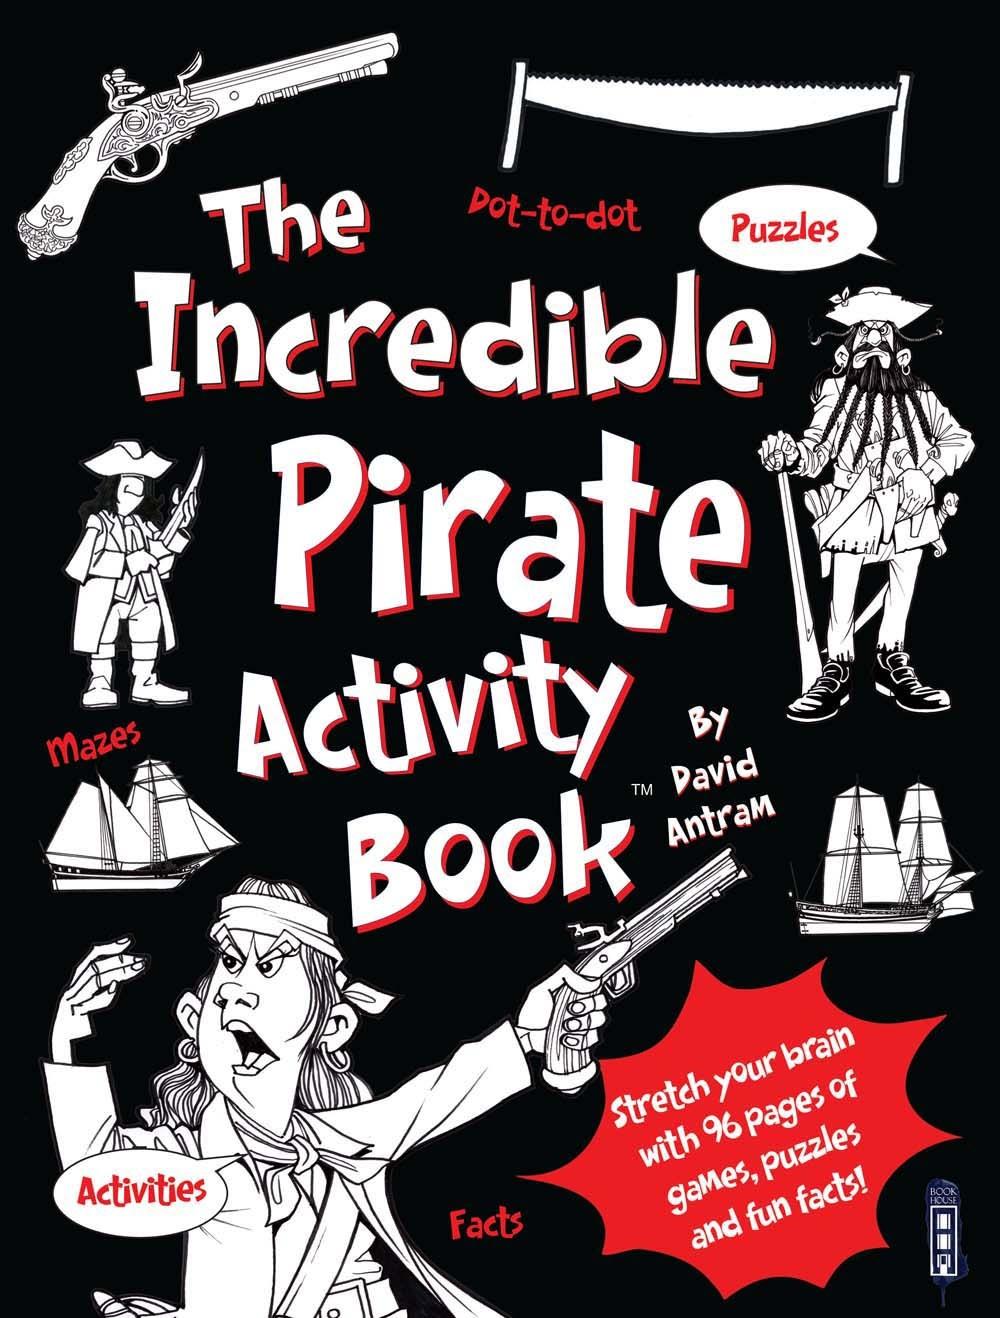 Incredible Pirate Activity Book.jpg